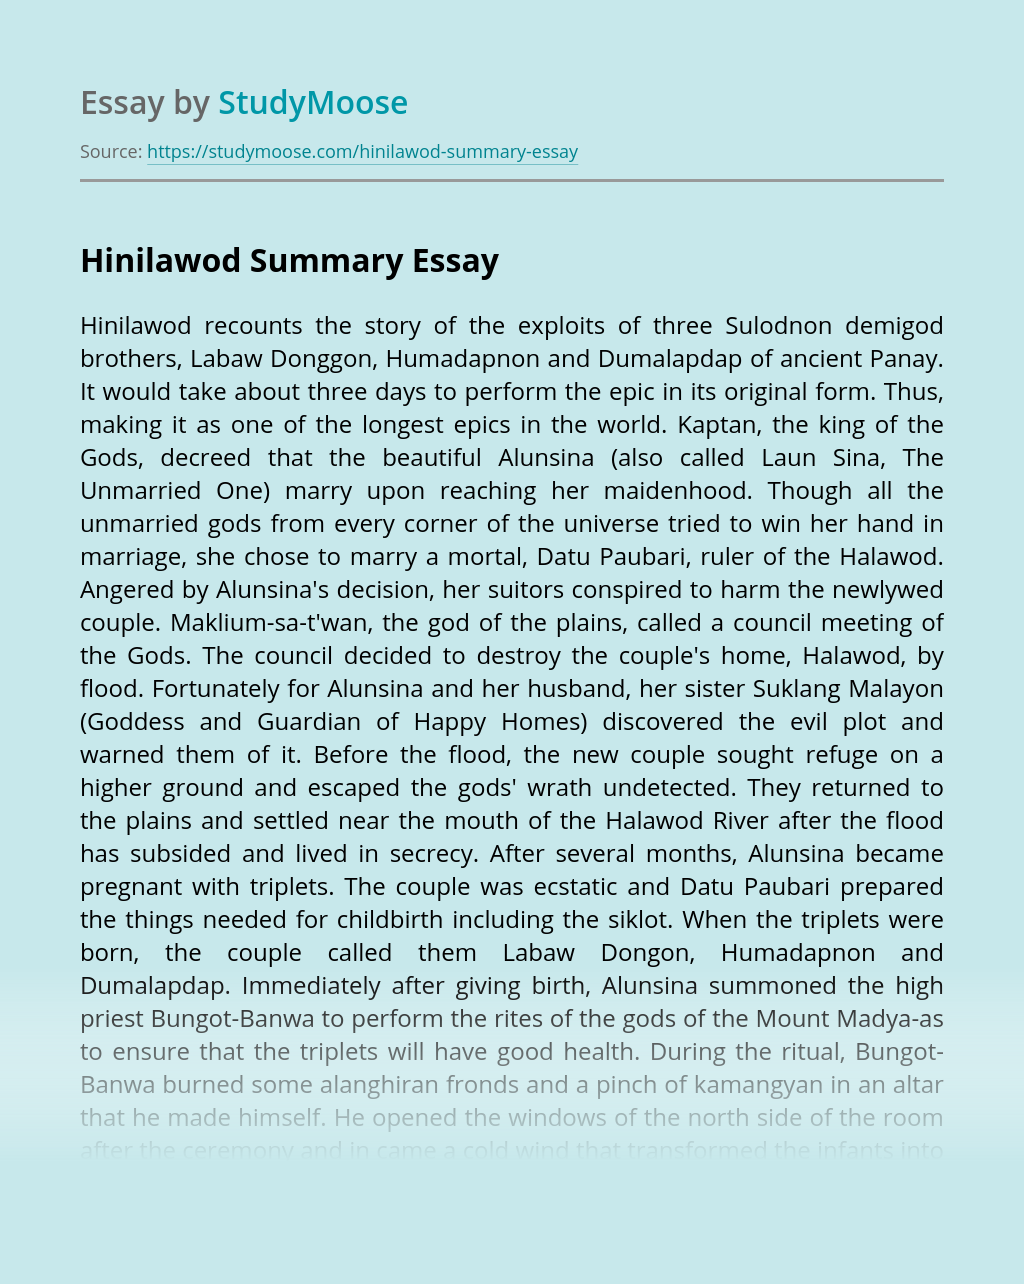 Hinilawod Summary